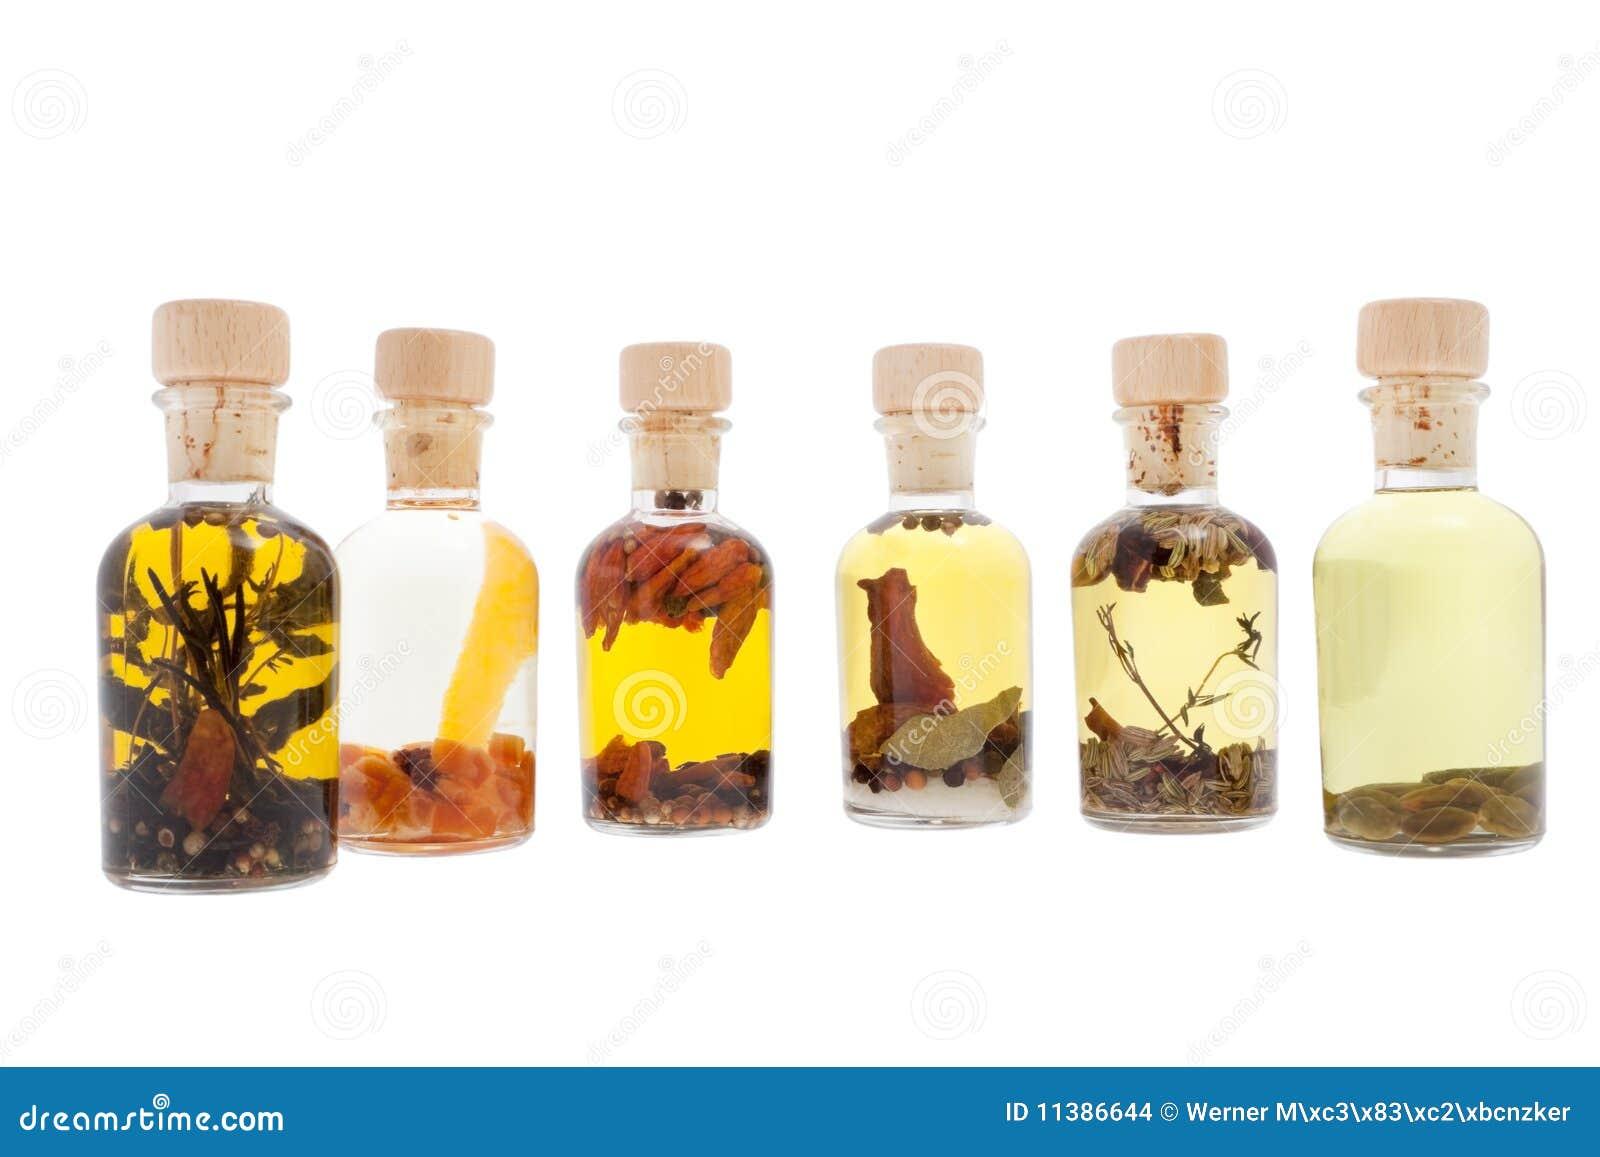 Profit margins draw edible oil makers to the premium segment